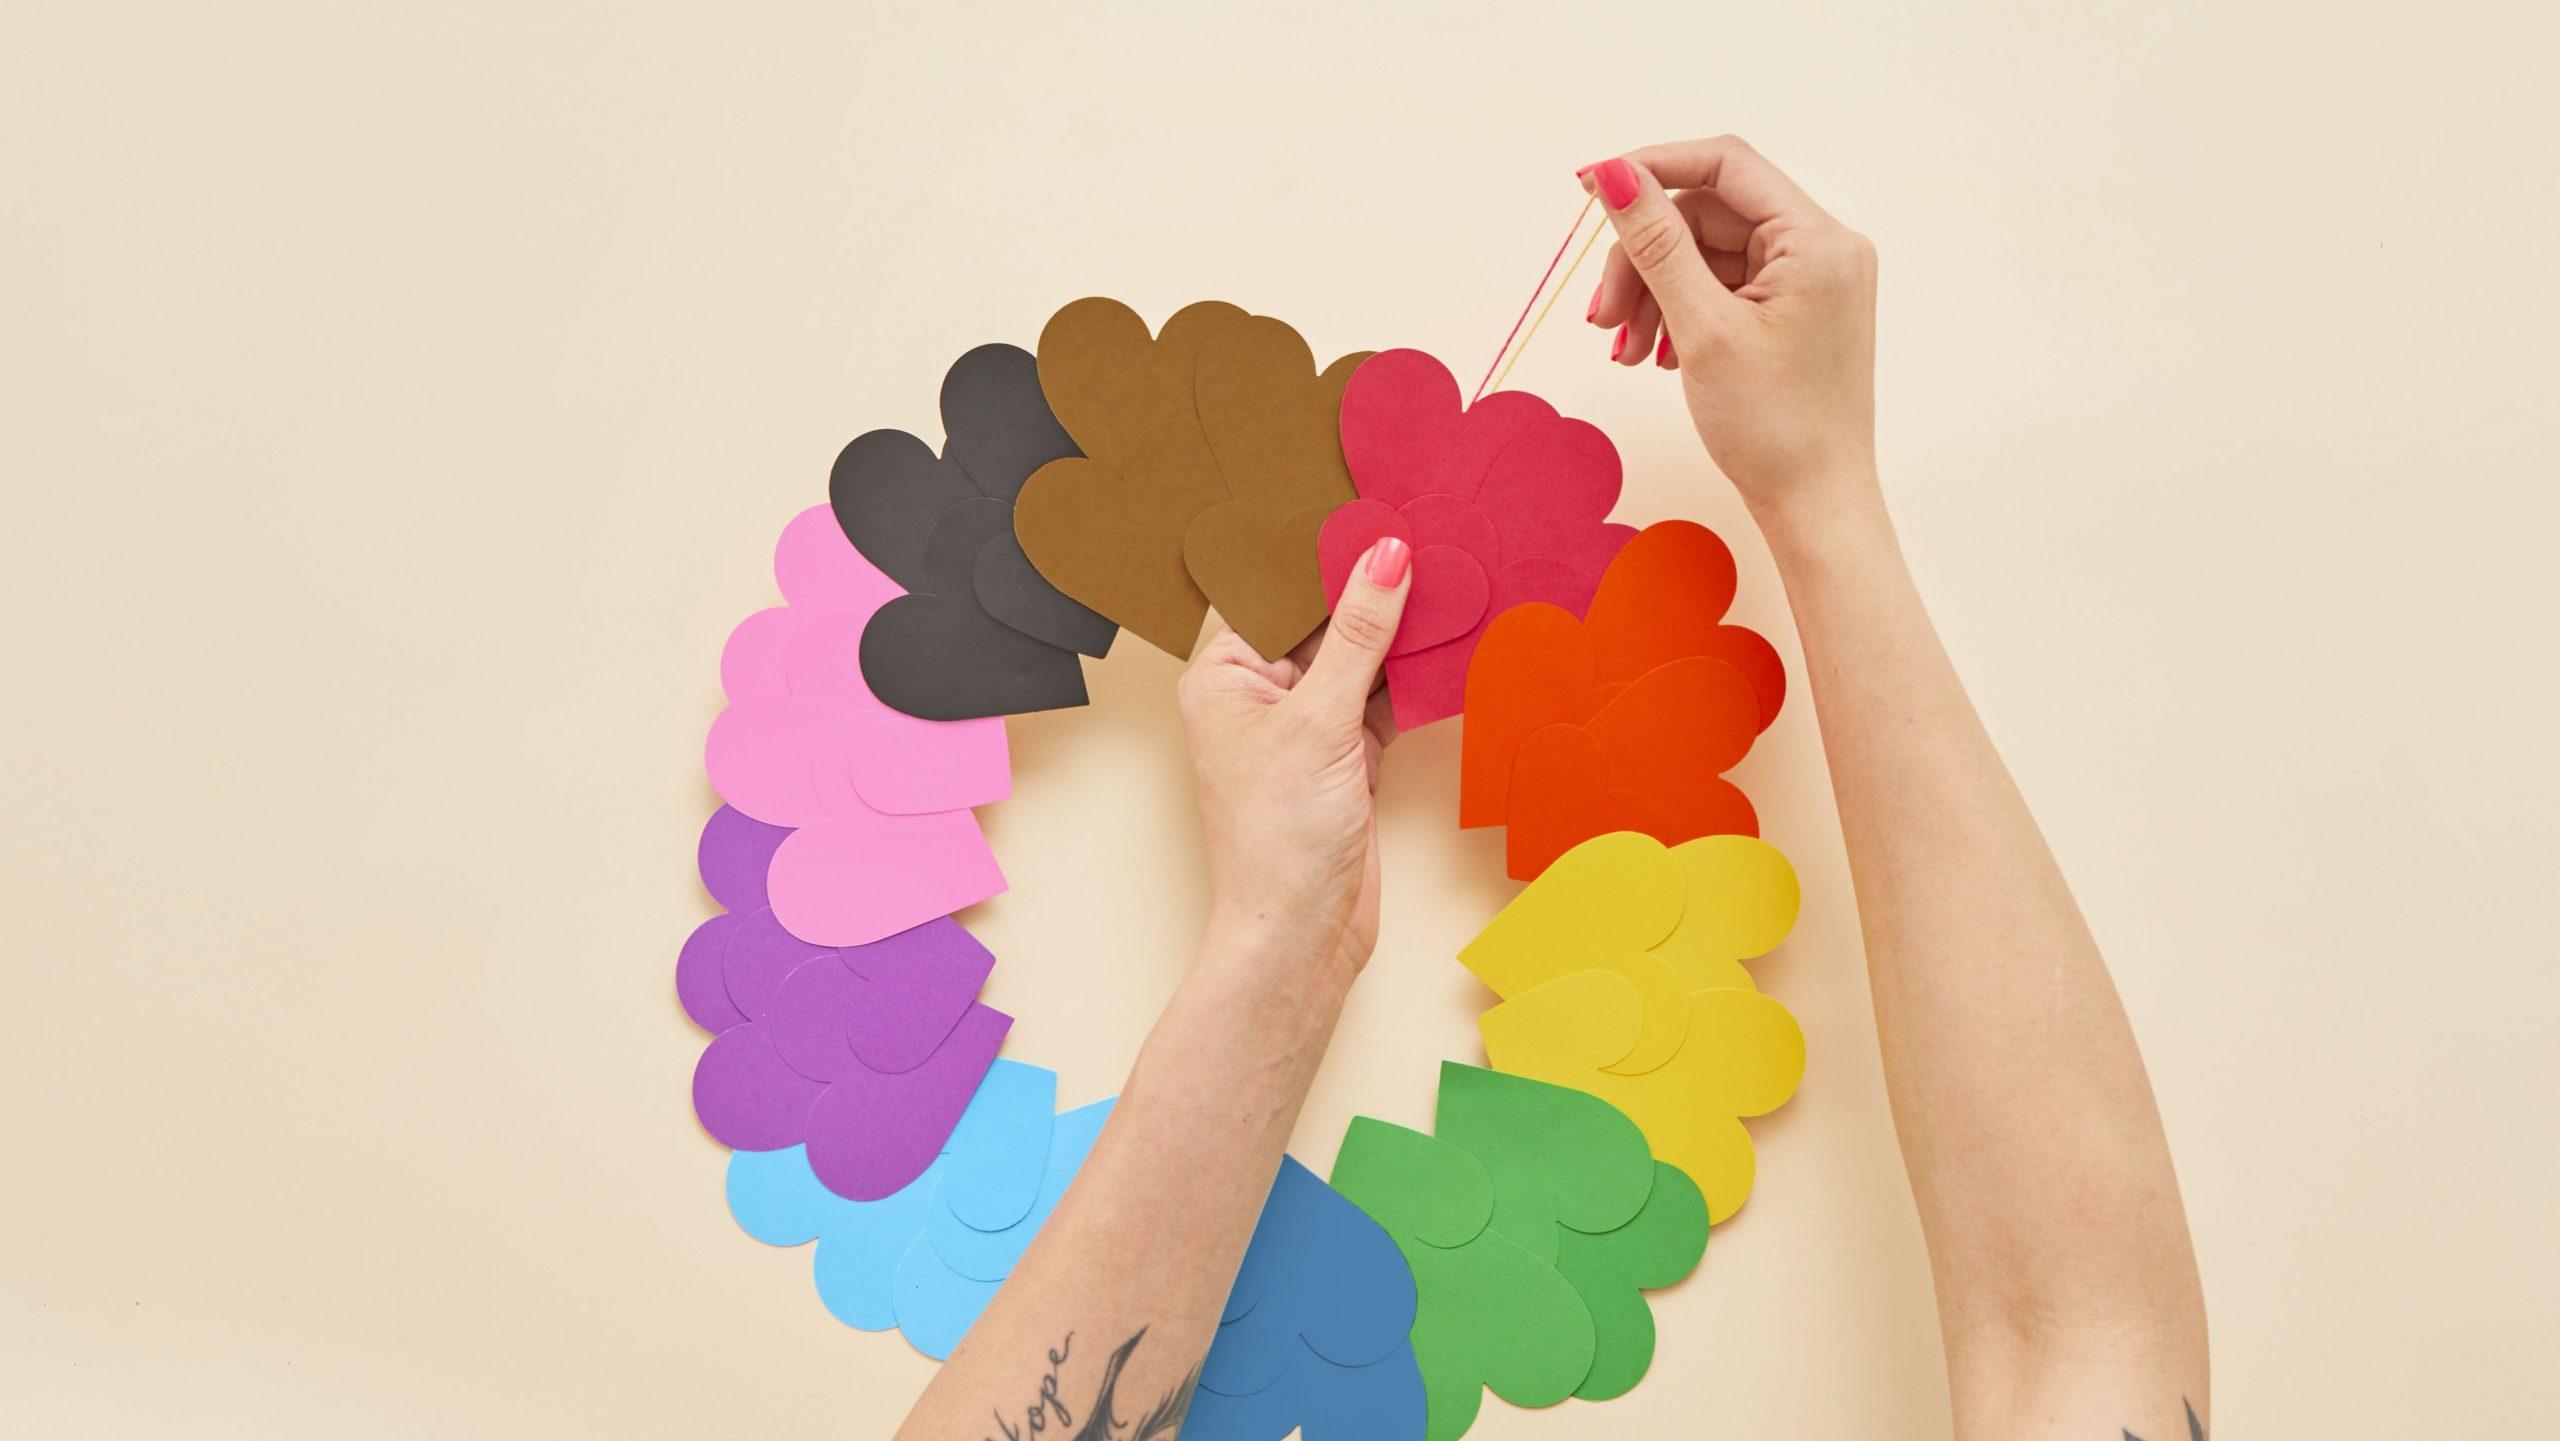 DIY Rainbow Paper Heart Craft